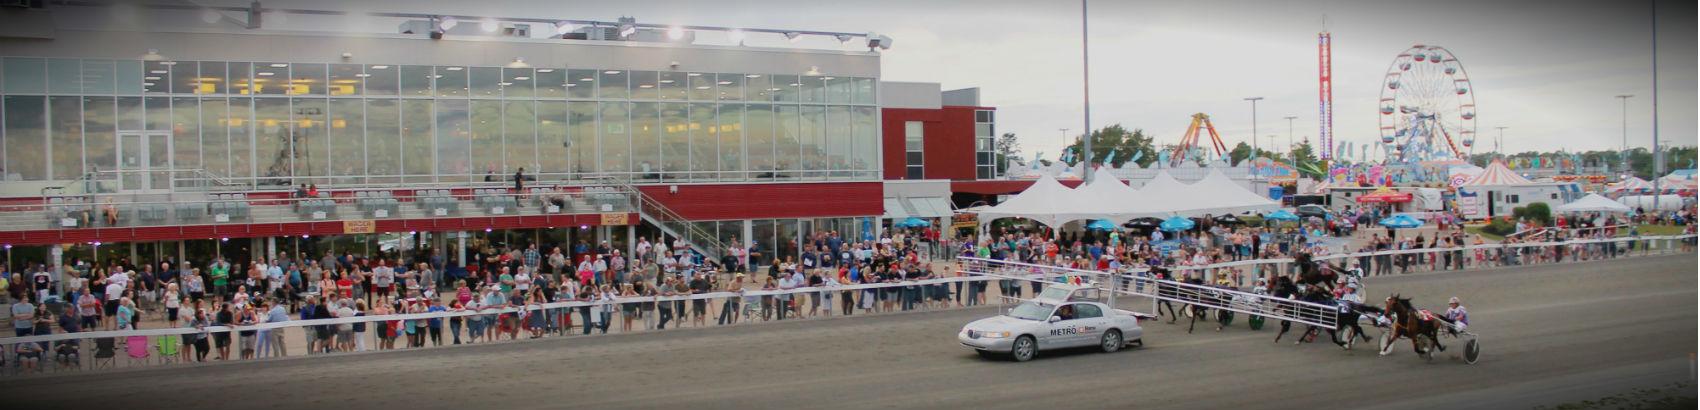 Red Shores Raceway